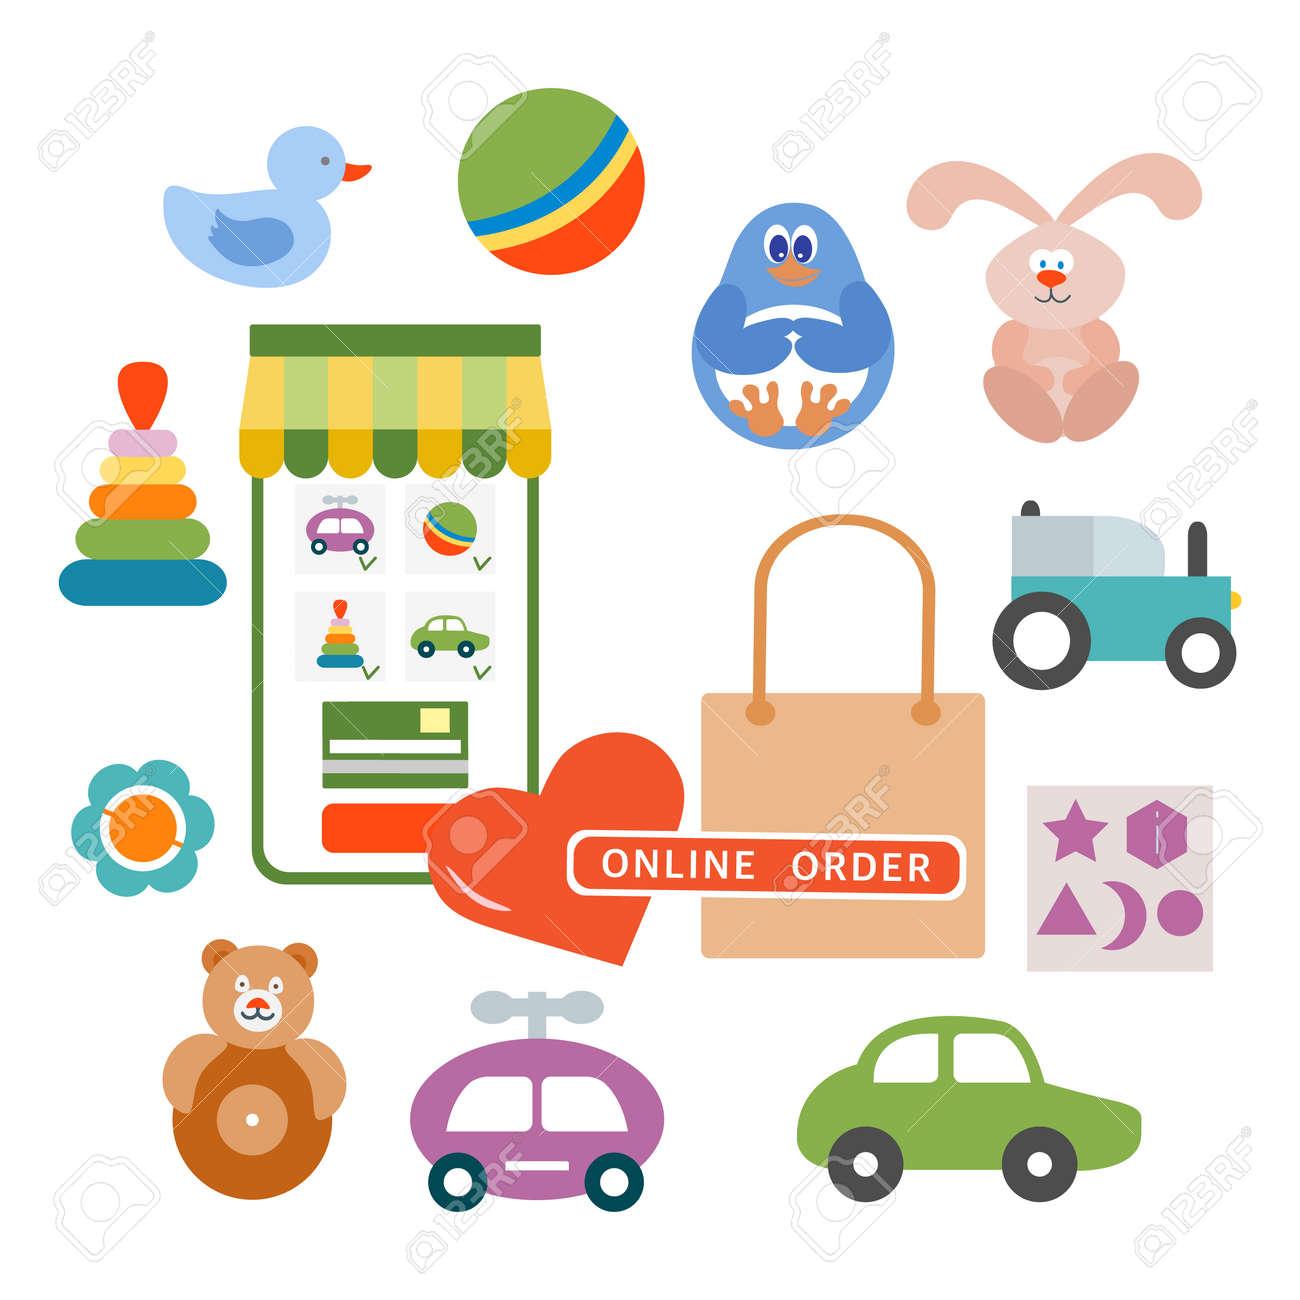 Vector illustration Online order Kid toys Happy childhood Gaming items Cars, pyramid, ball, rattle, tumbler, rabbit, duck, penguin, sorter Primary school Elementary grade Kindergarten Game Play - 170249918